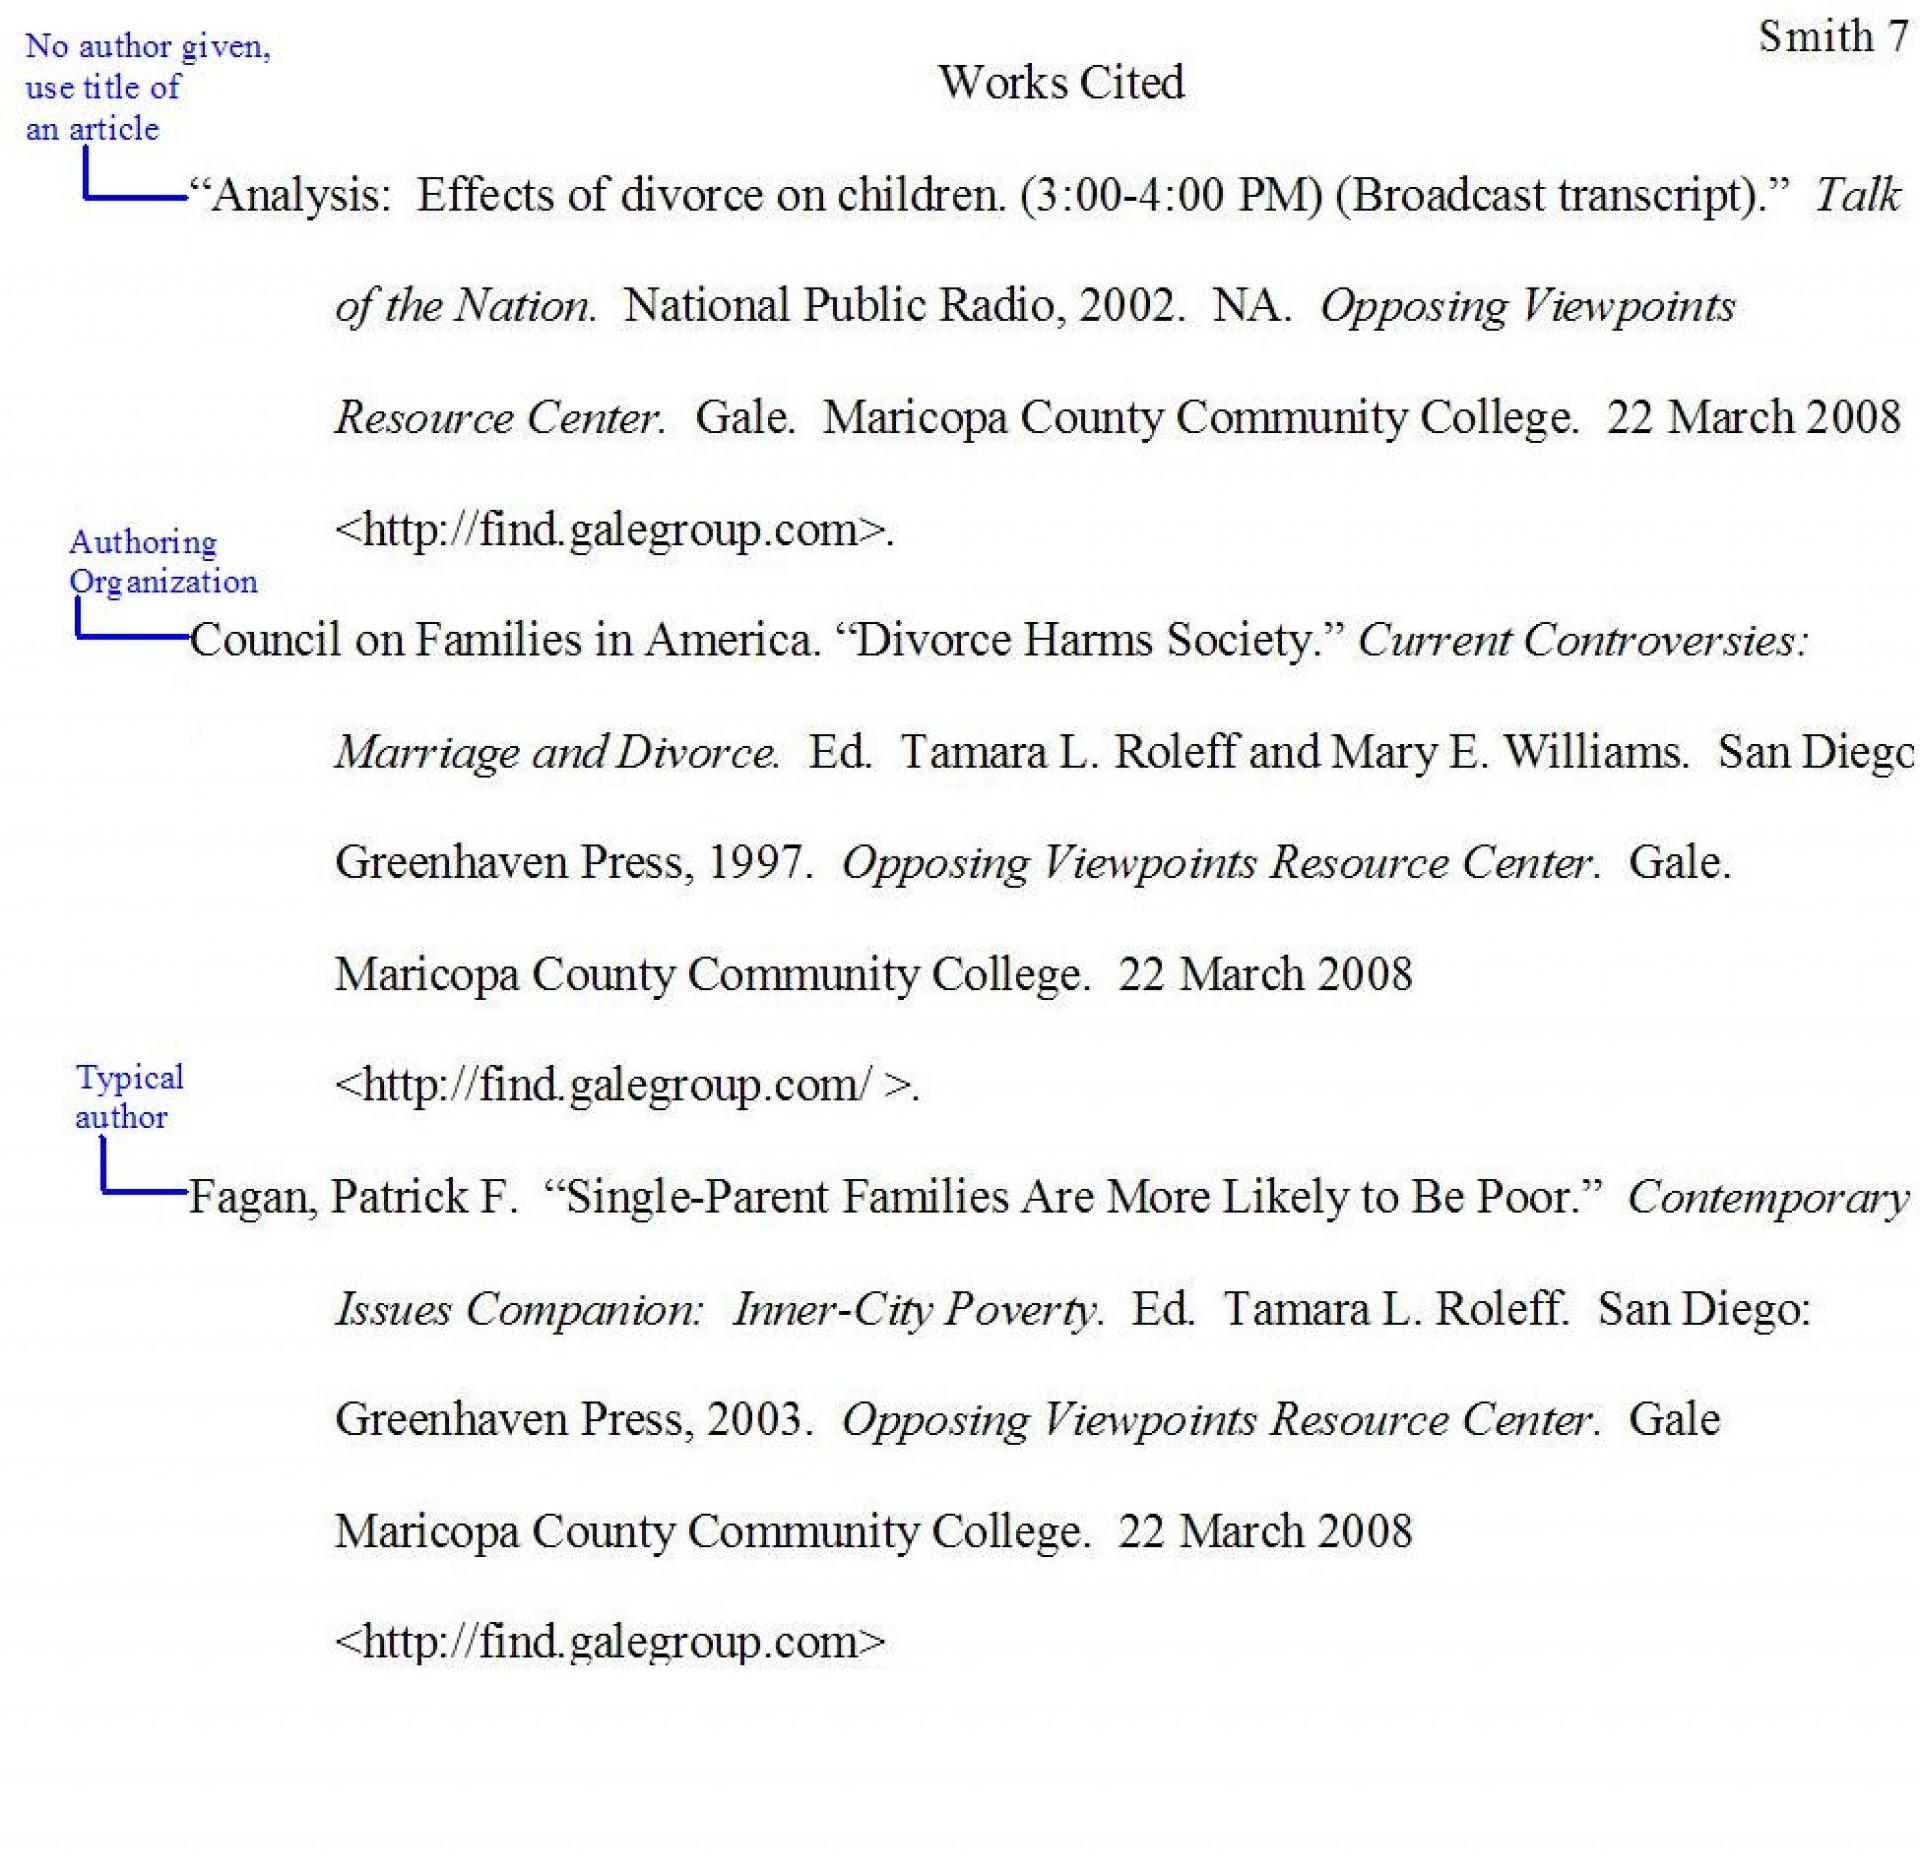 001 Mla Essay Citation Samplewrkctd Jpg Fantastic Cite Within Book Format In Example 1920